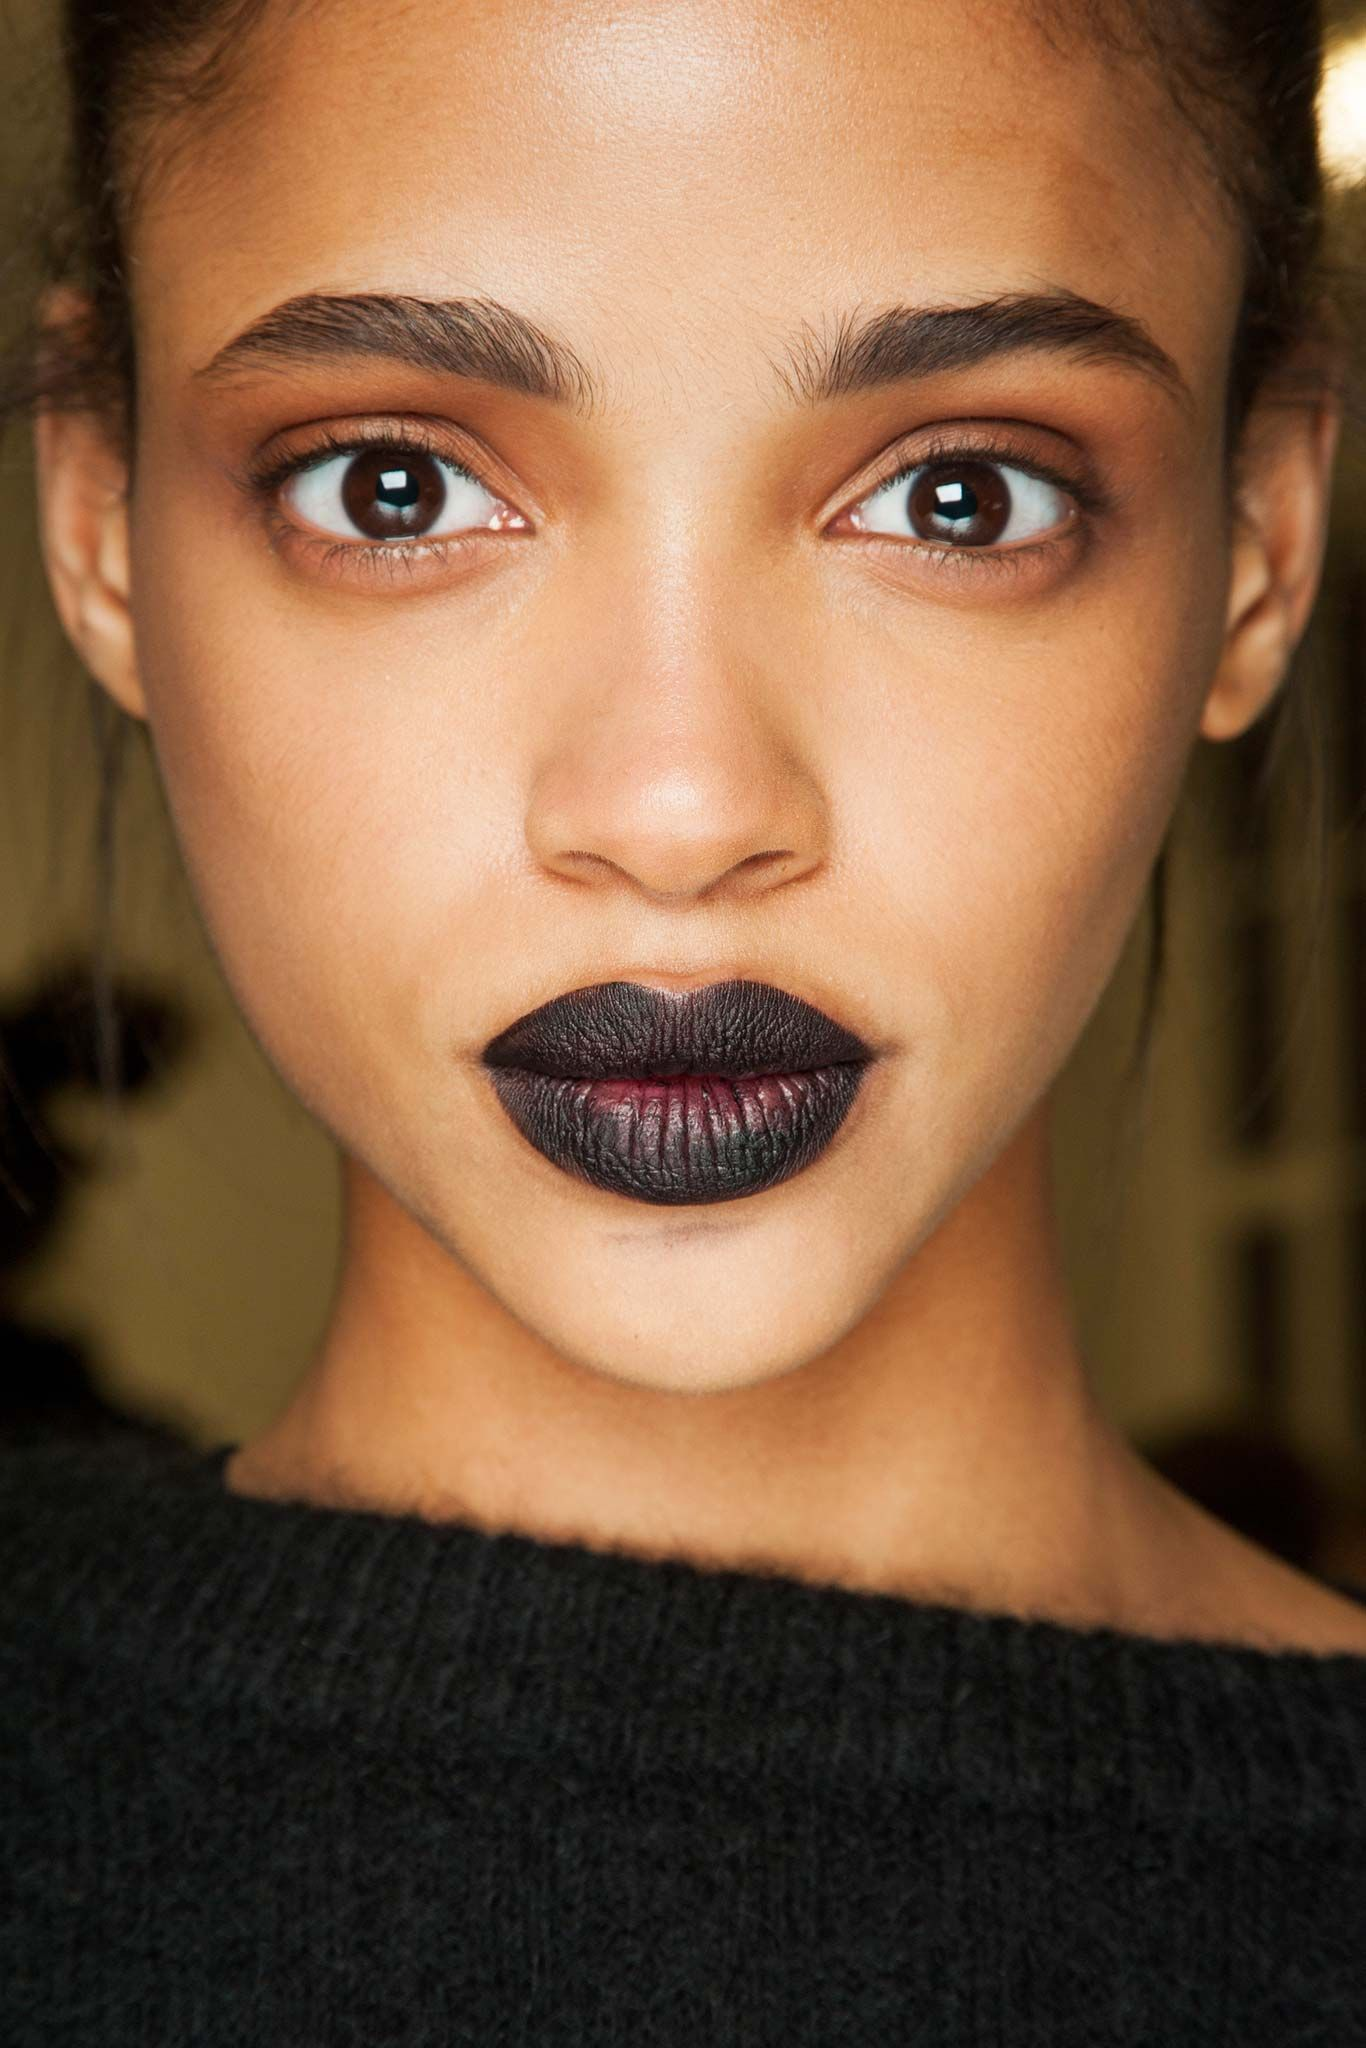 Giles fw rtw london hq makeup beauty skincare tips